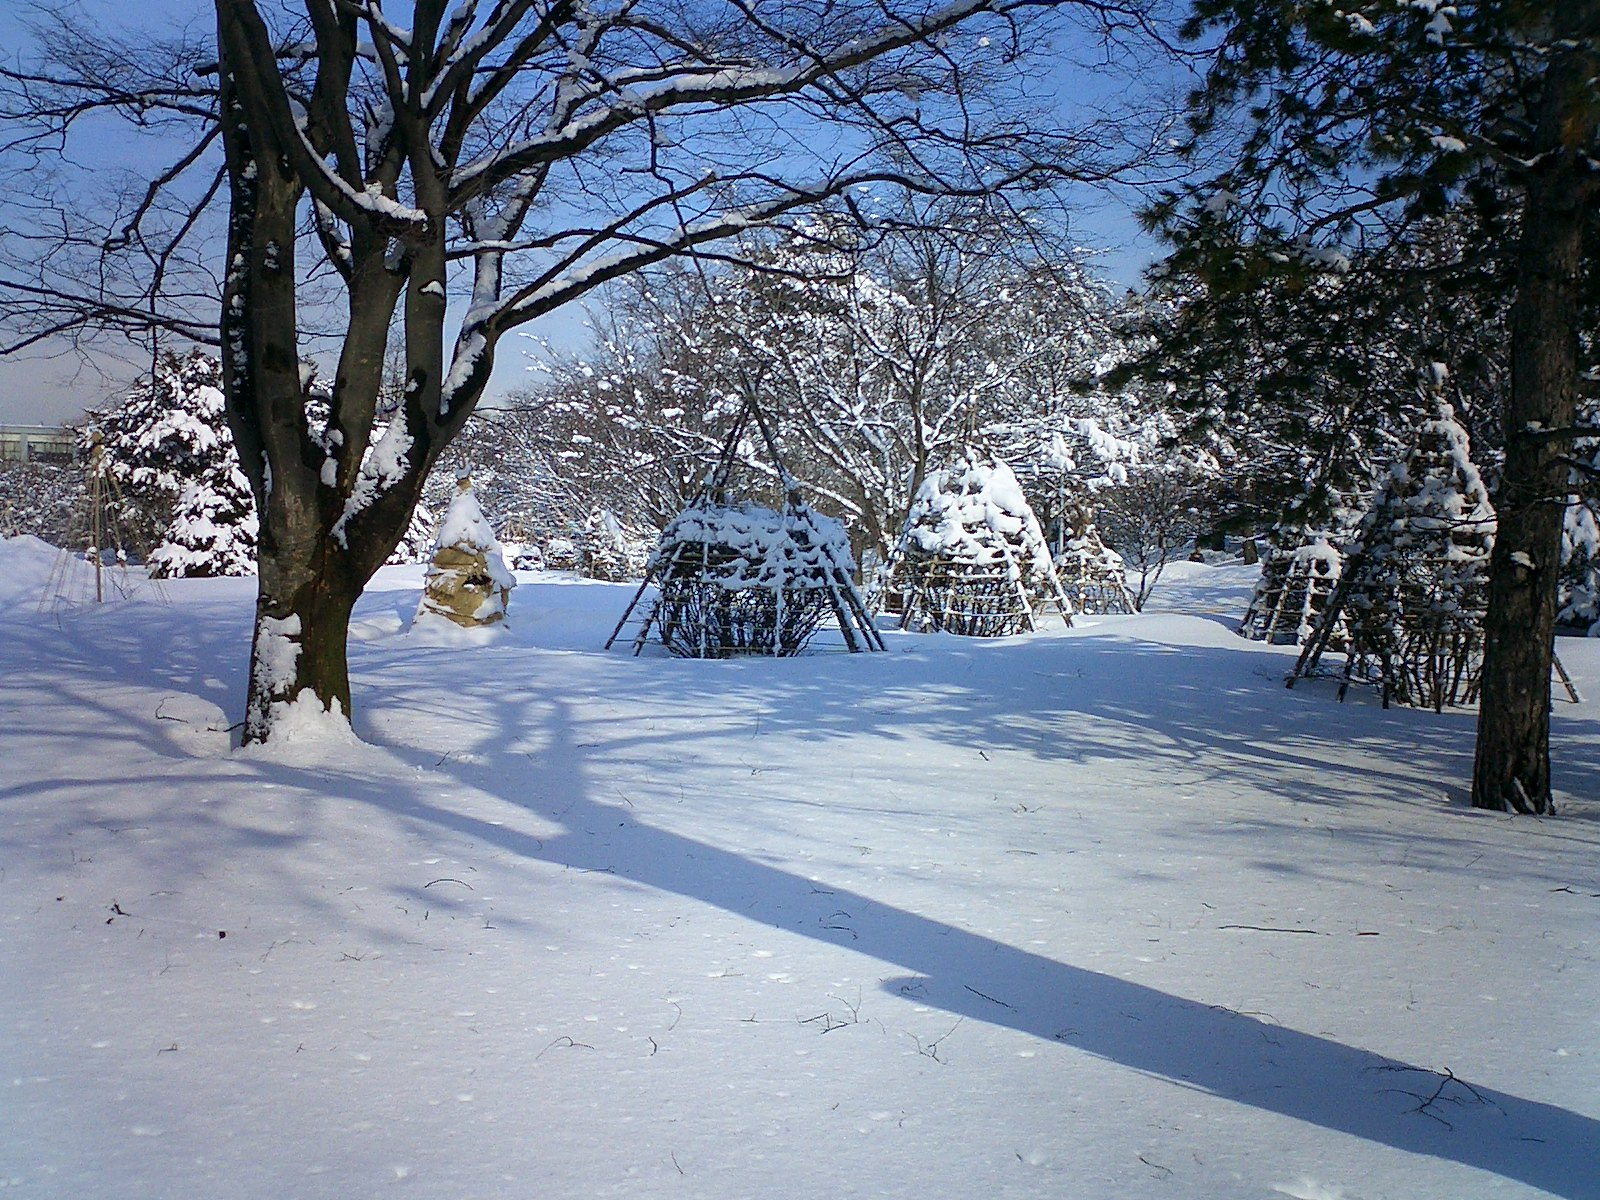 http://kino-ap.eng.hokudai.ac.jp/Hokudai_pictures/winter4O.jpg